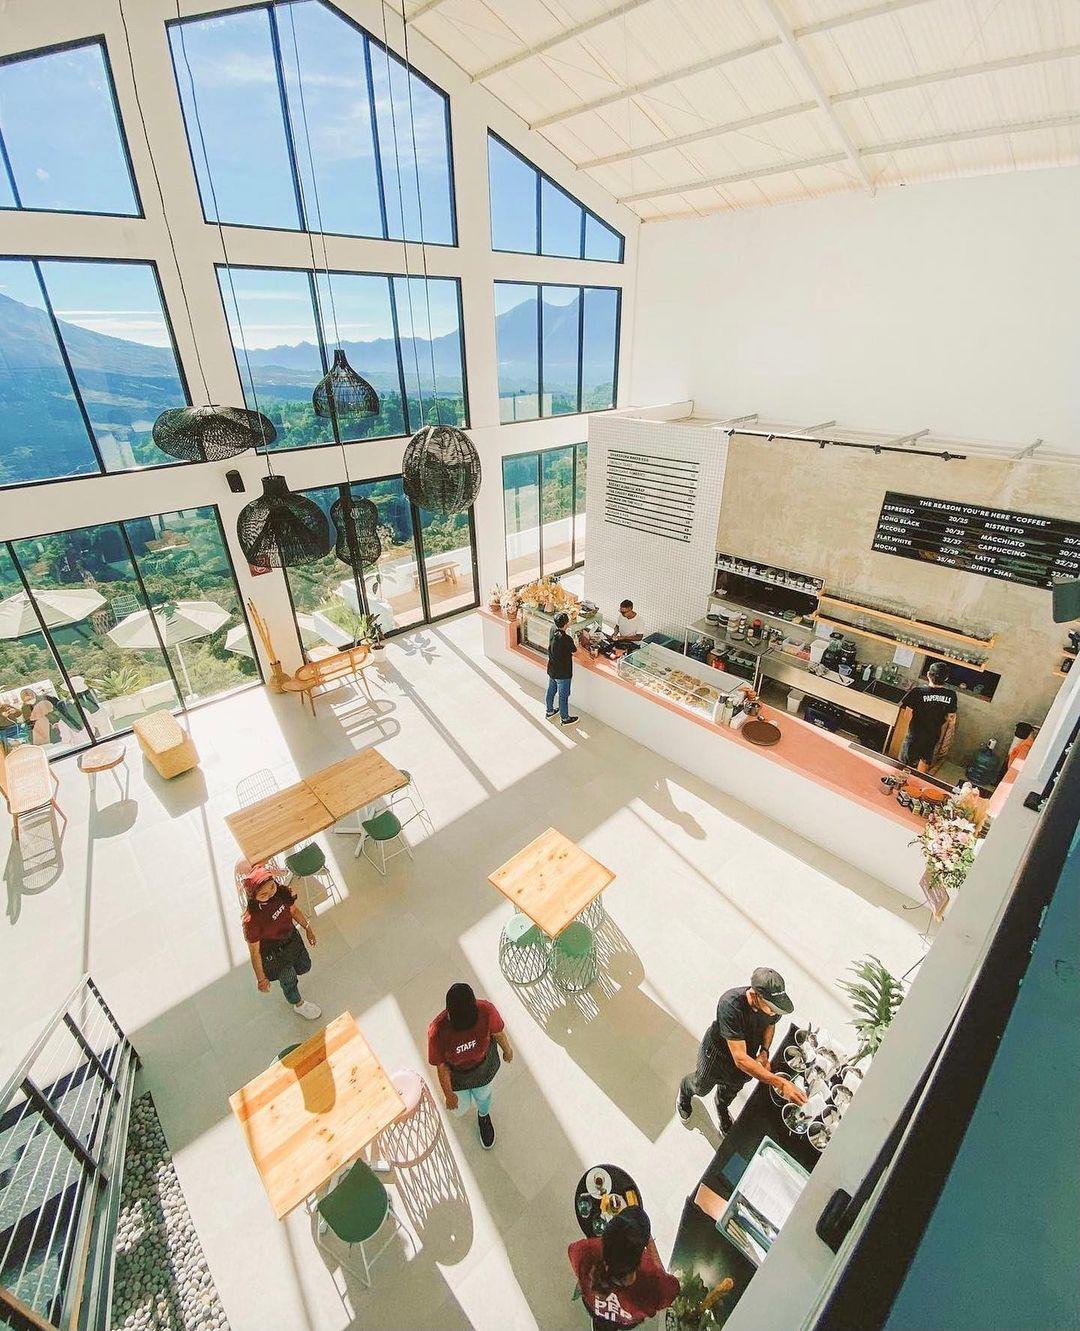 Bagian Indoor Paperhills Cafe Kintamani Image From @kulinersamamas